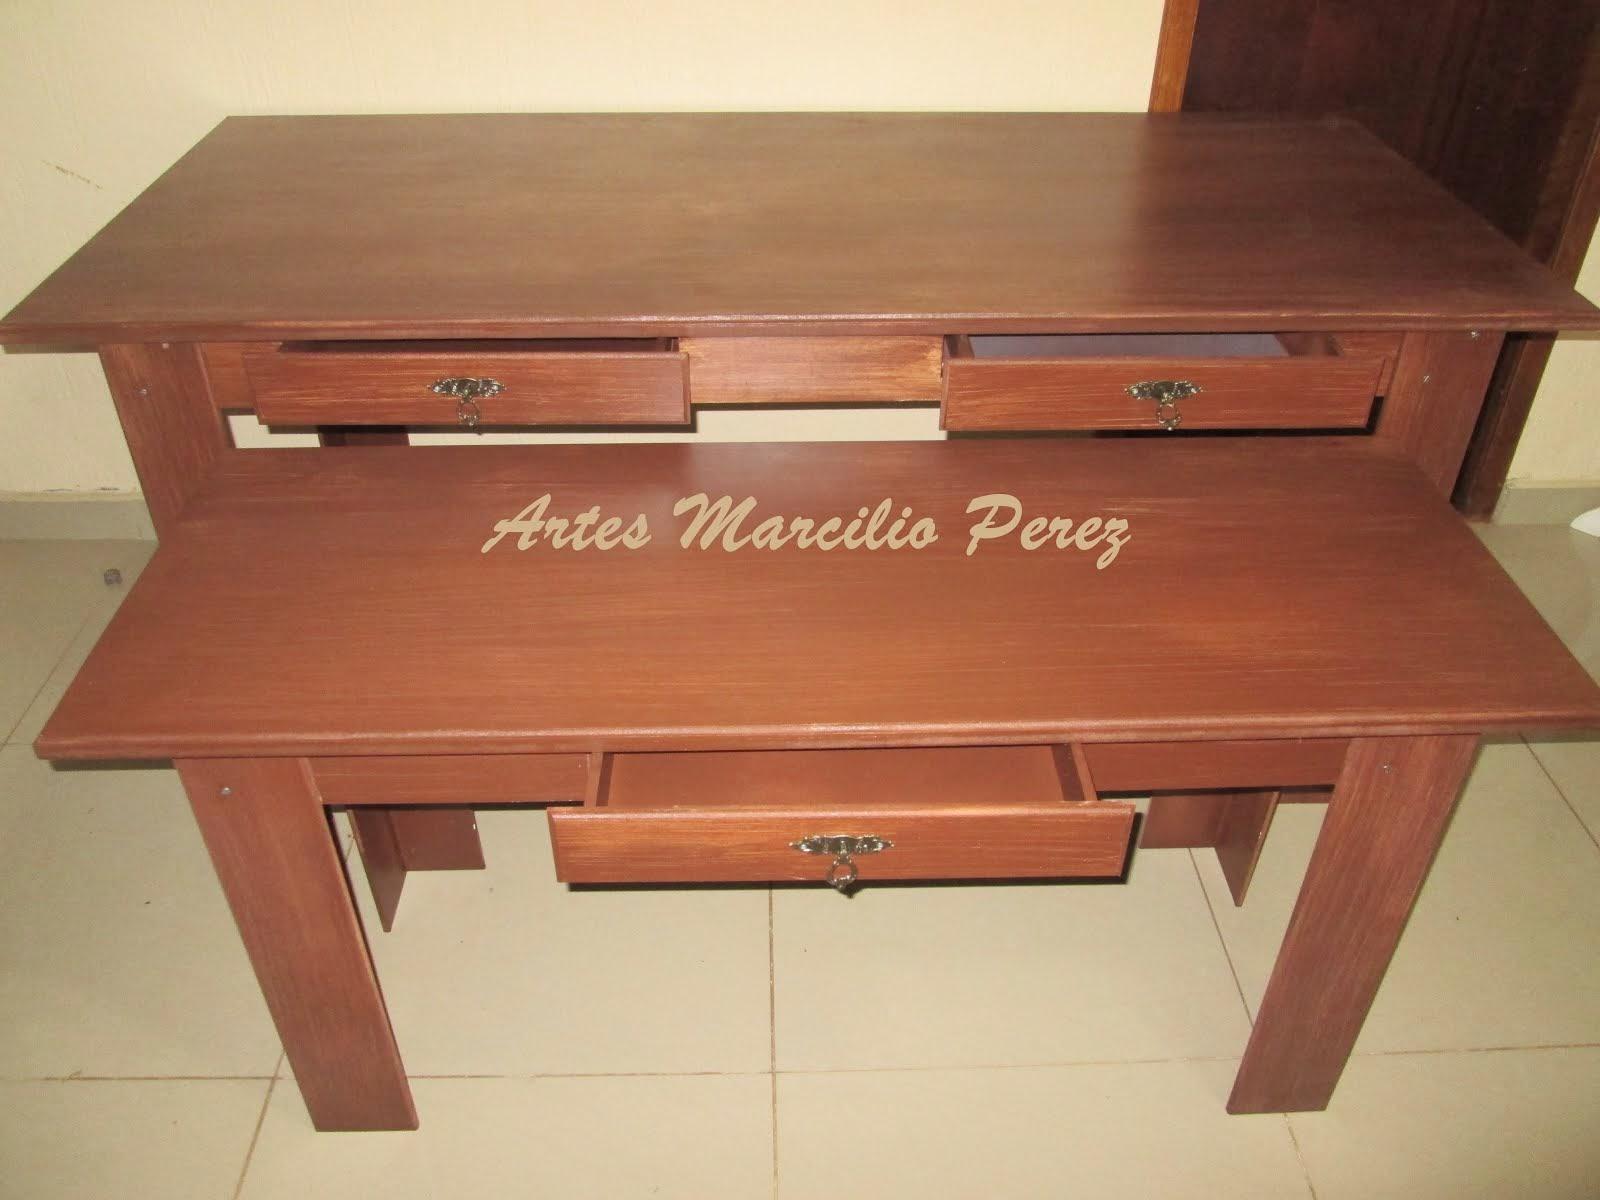 Conjunto de mesas rusticas R$ 900,00 medidas  1.80x80x80A e 1.40x50x65A